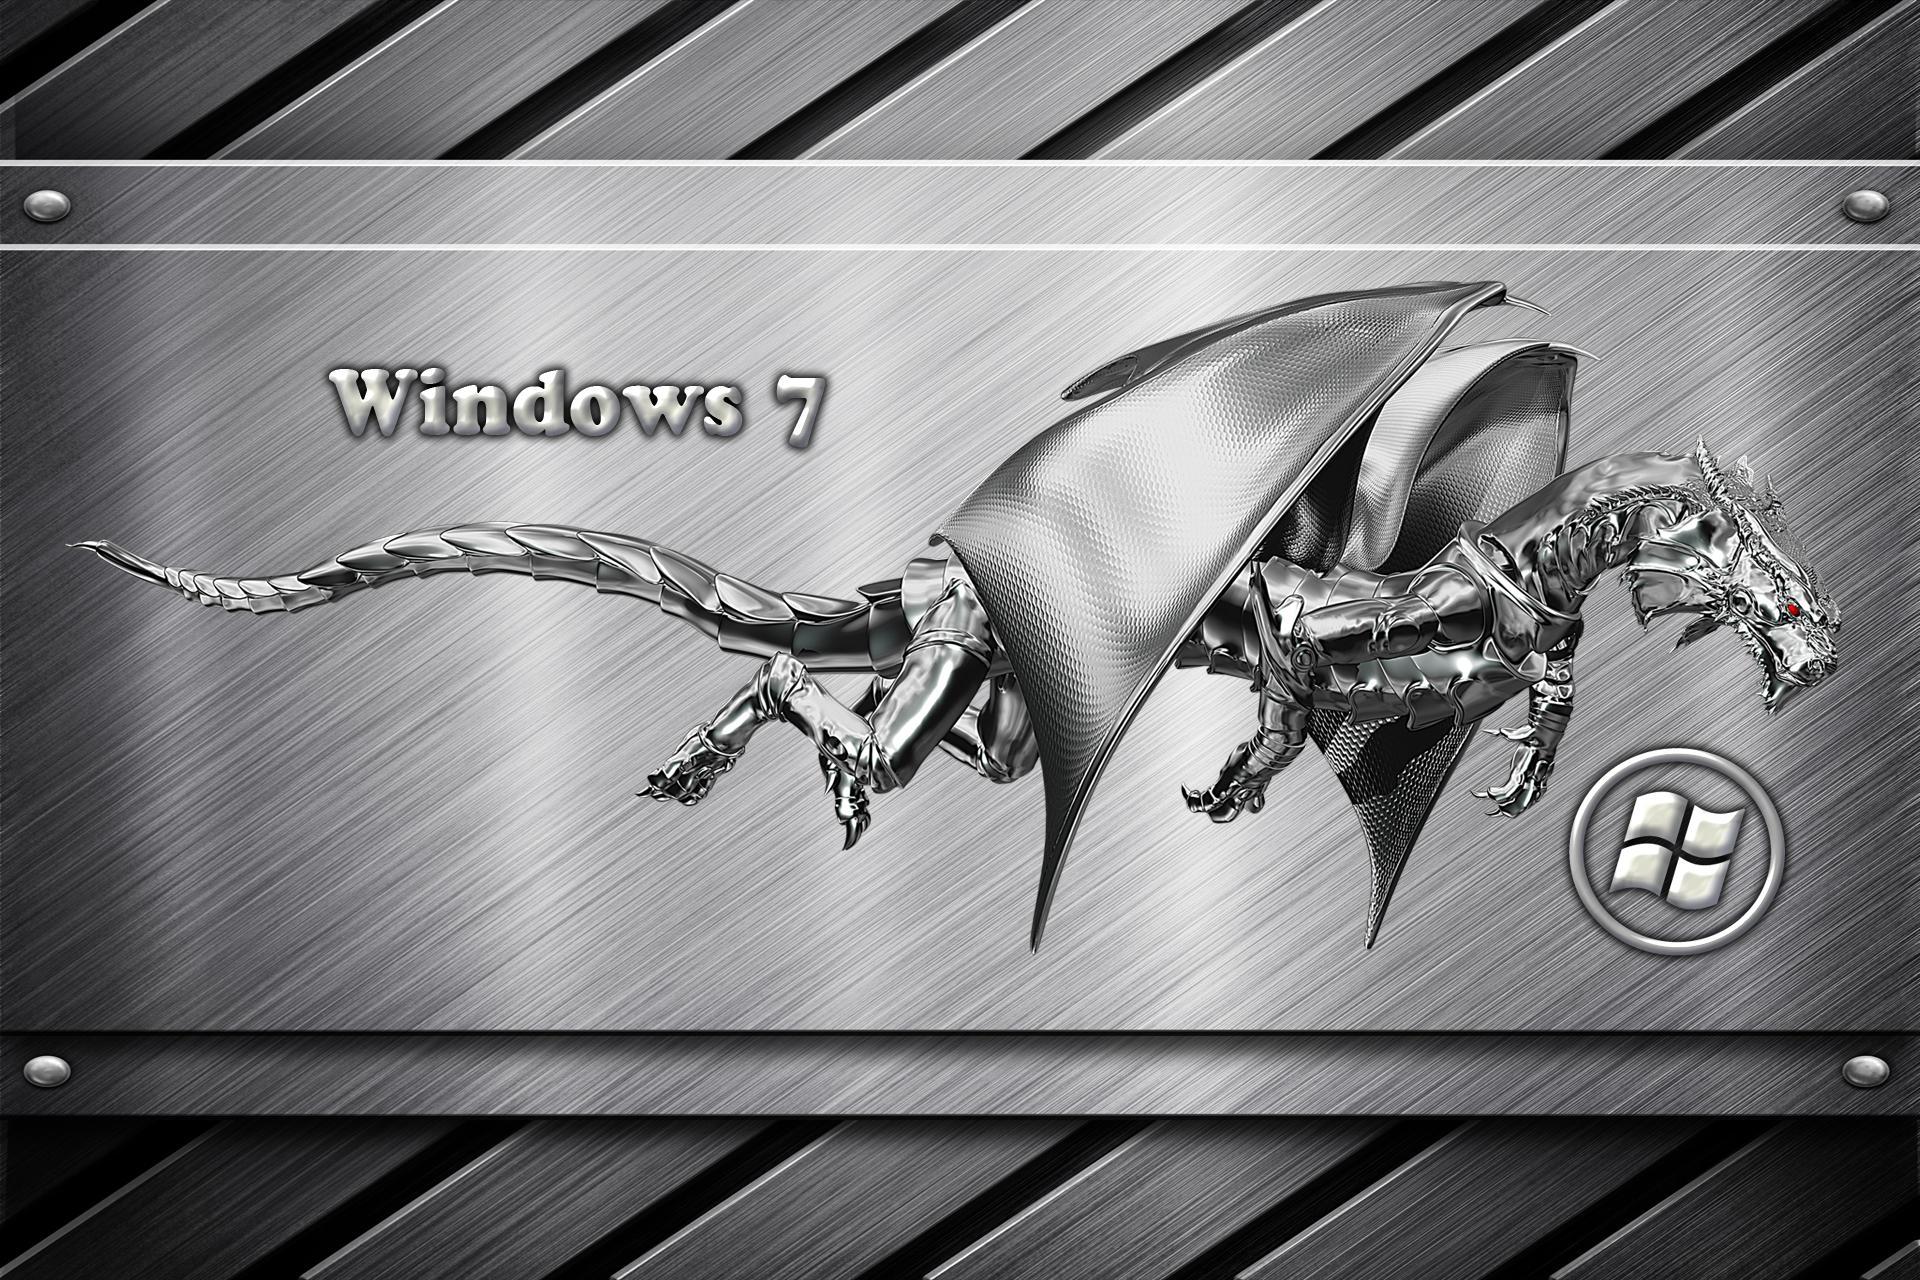 Win 7 Metal Dragon Wallpapers 1920x1280 544435